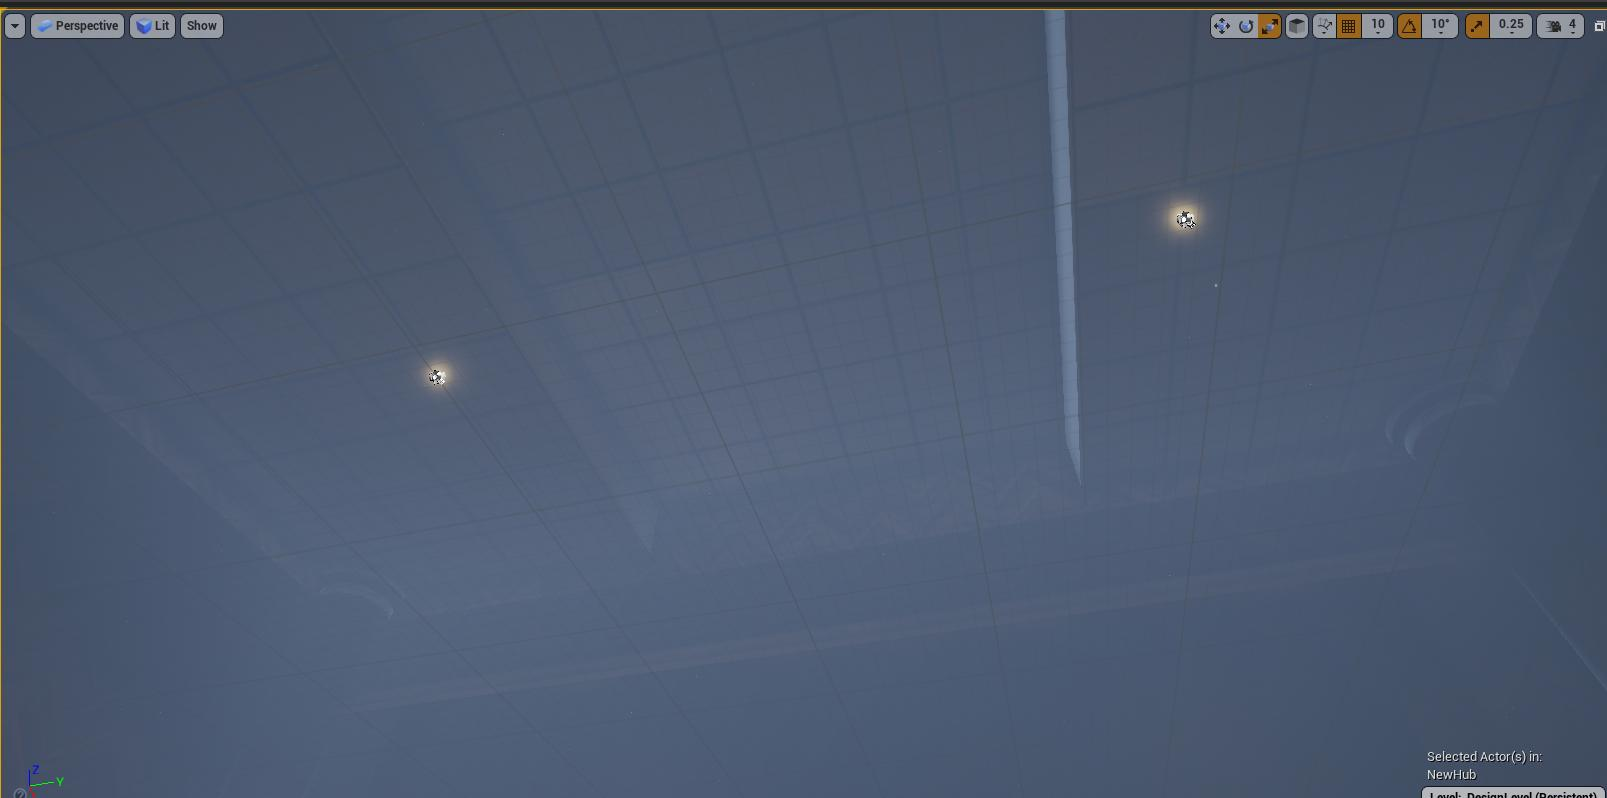 Very dense blue fog on the ceiling